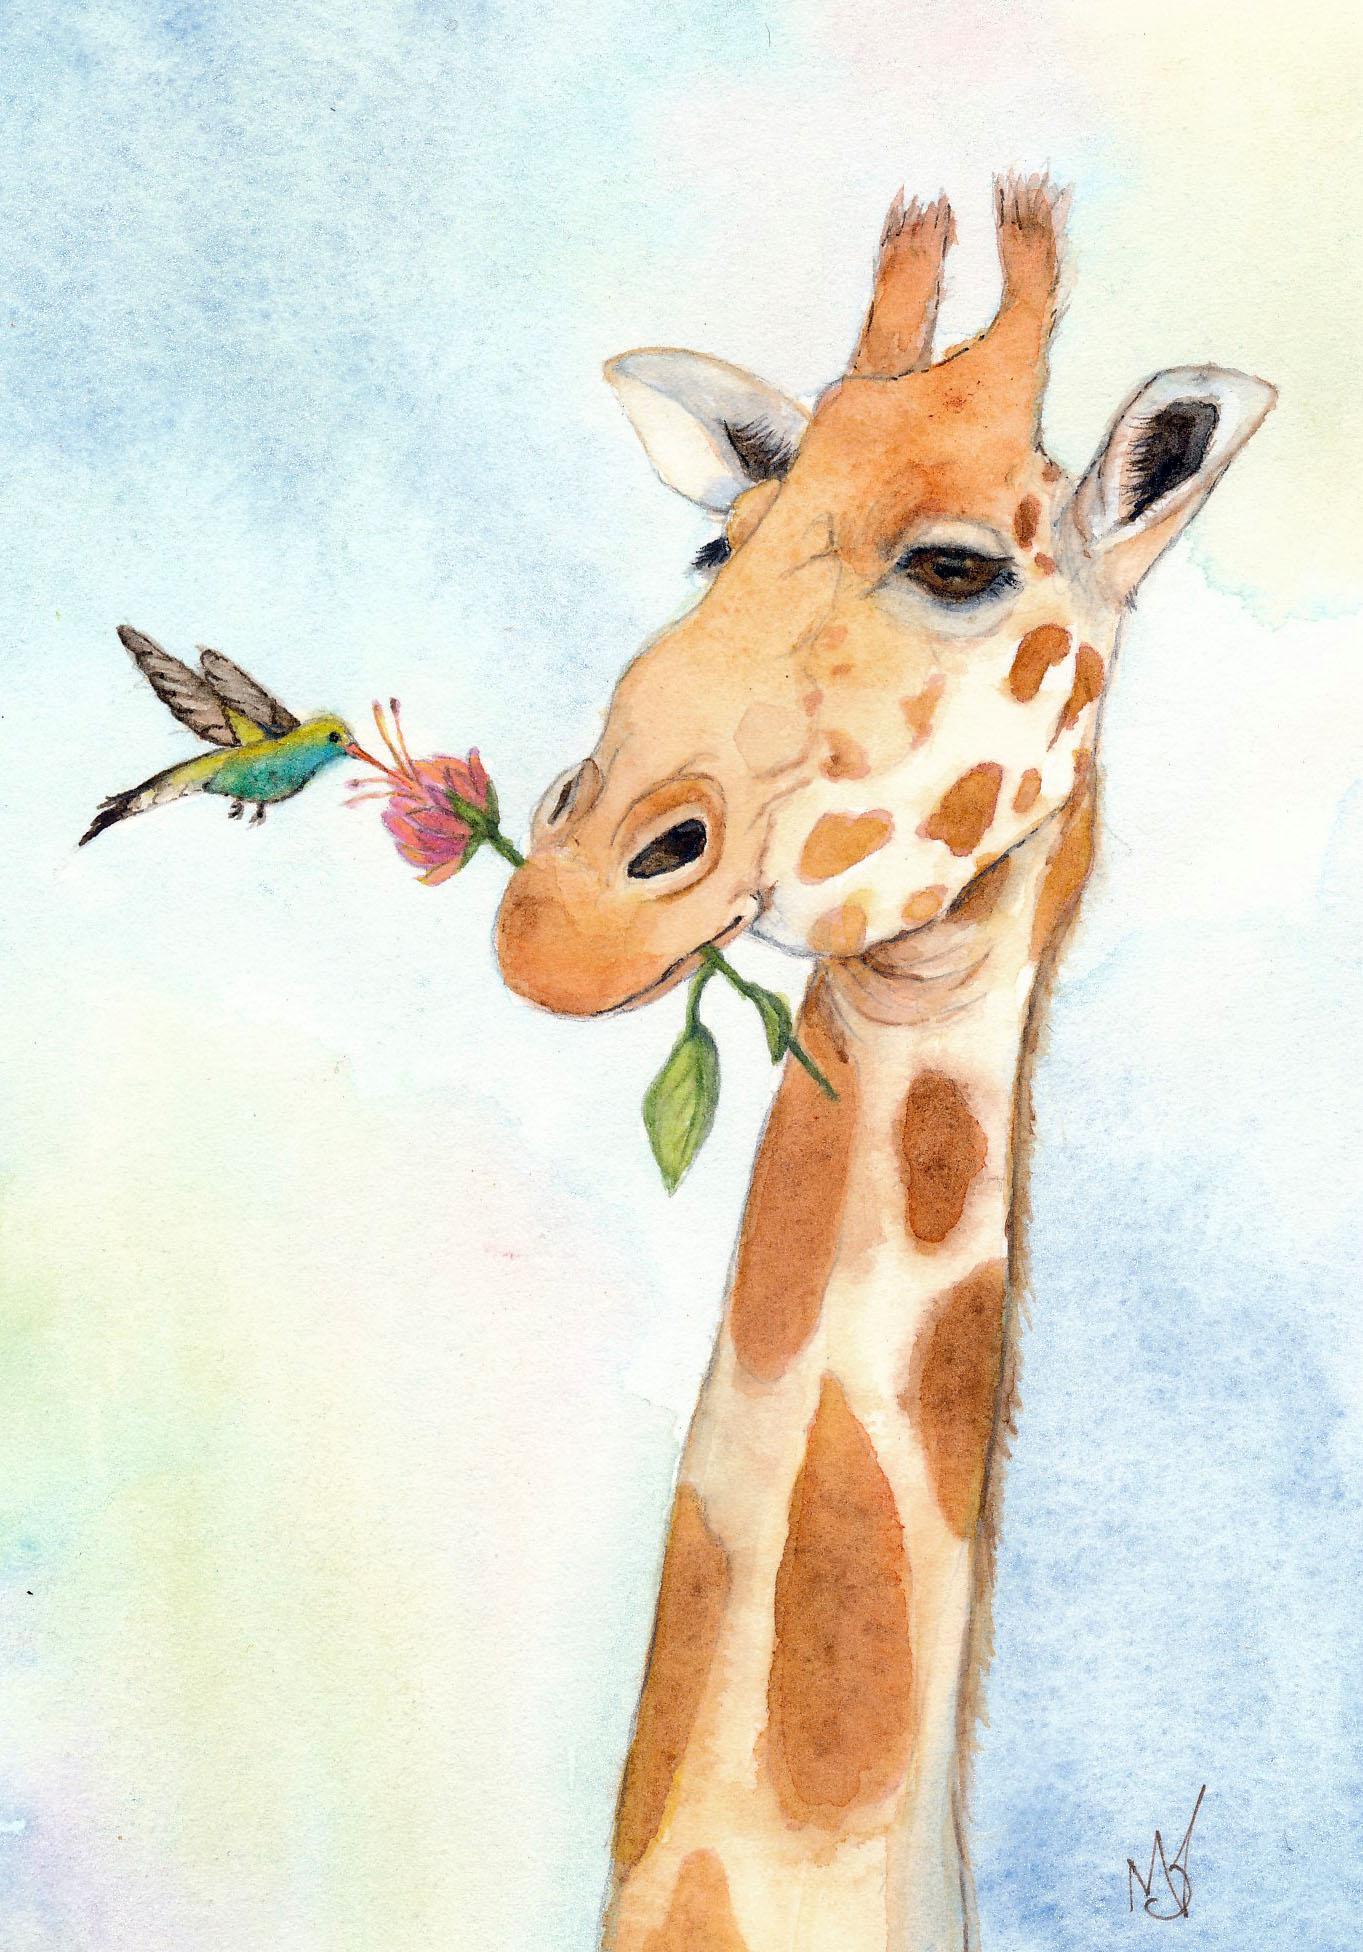 Giraffe and Hummingbird